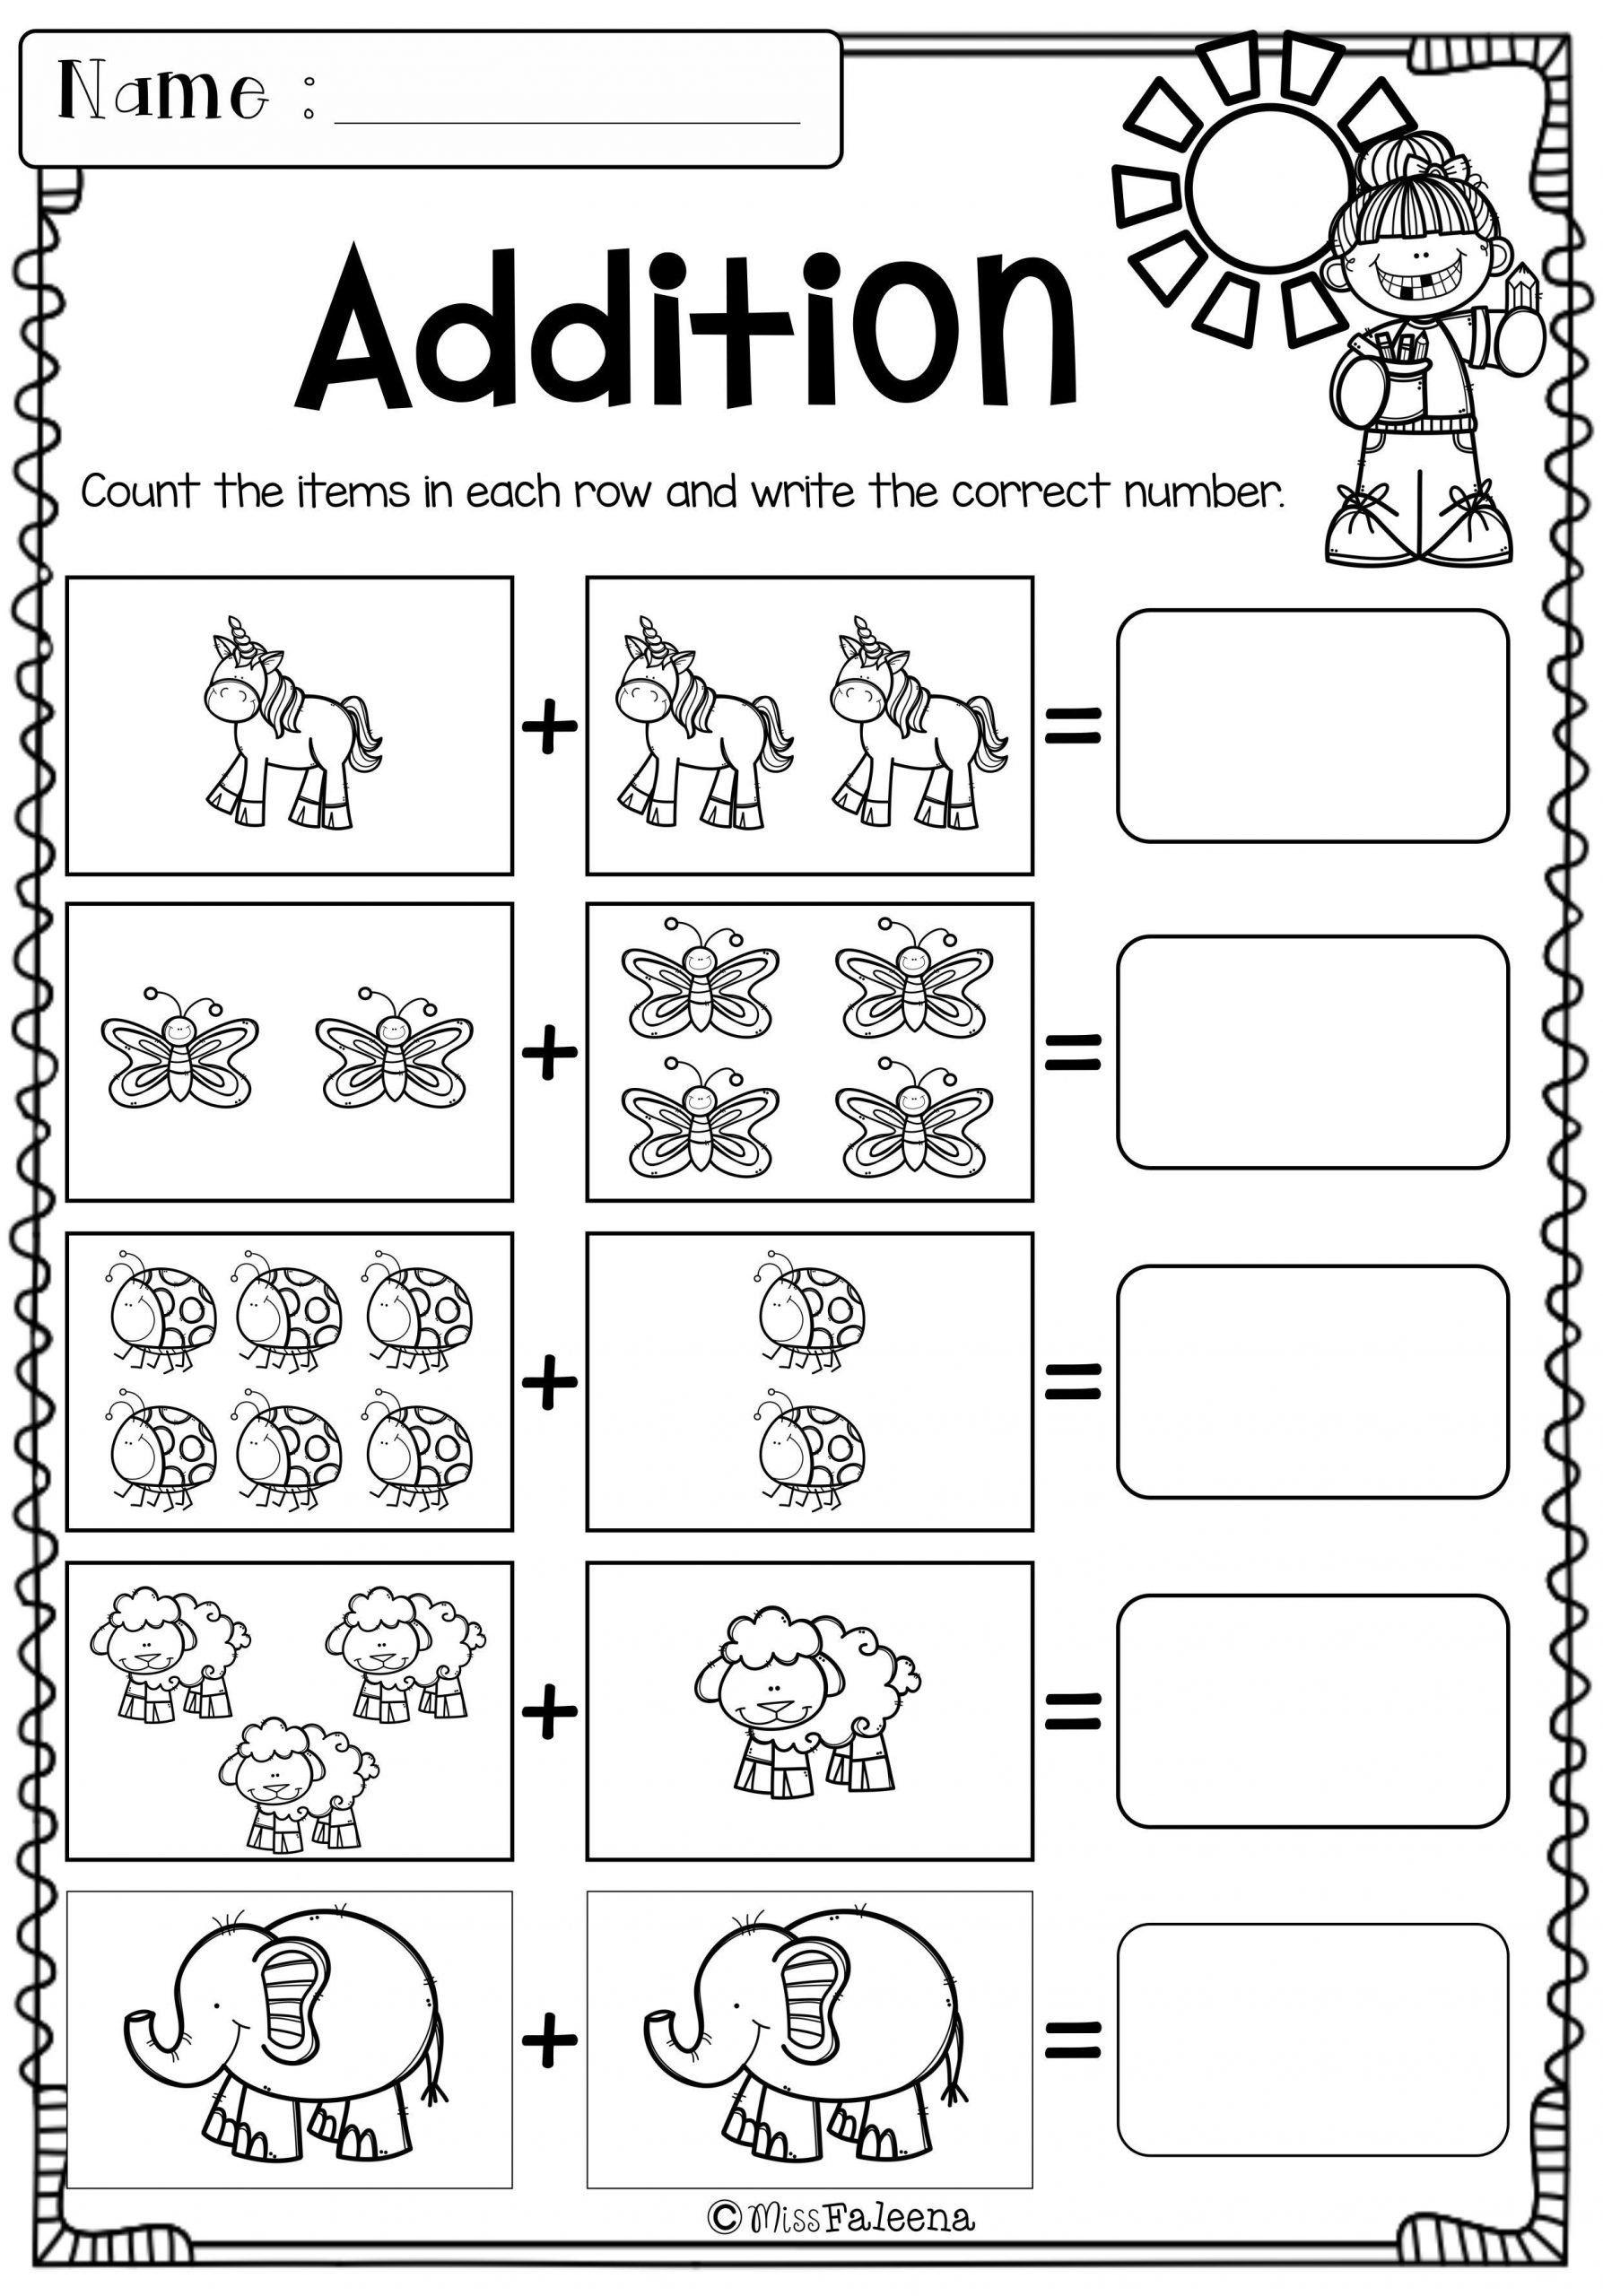 20 Morning Worksheets For Kindergarten In